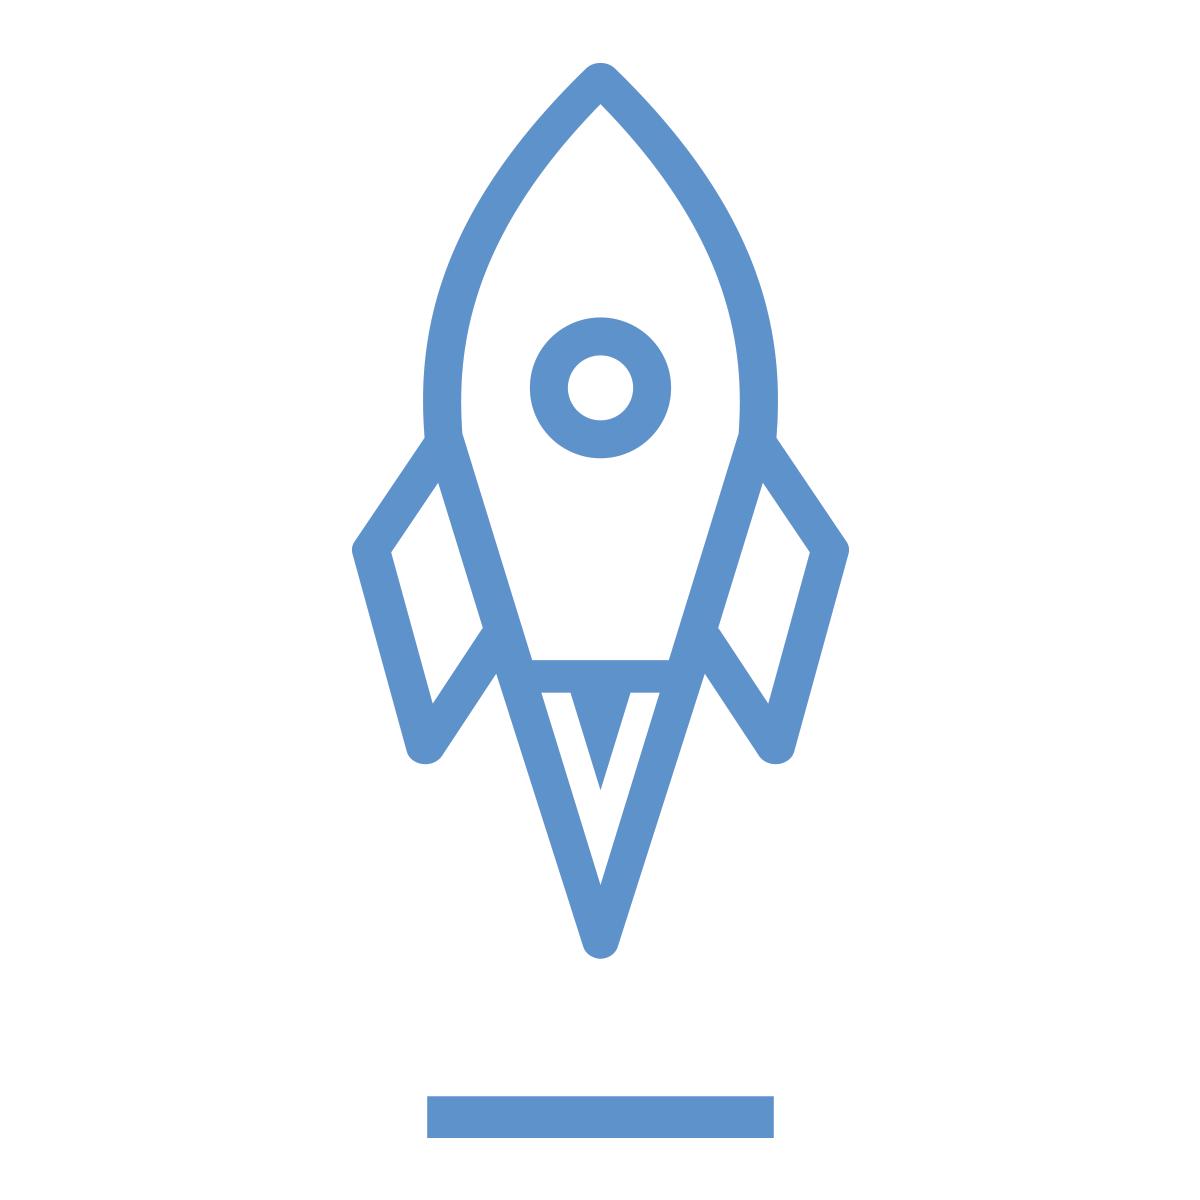 LaunchCode logo